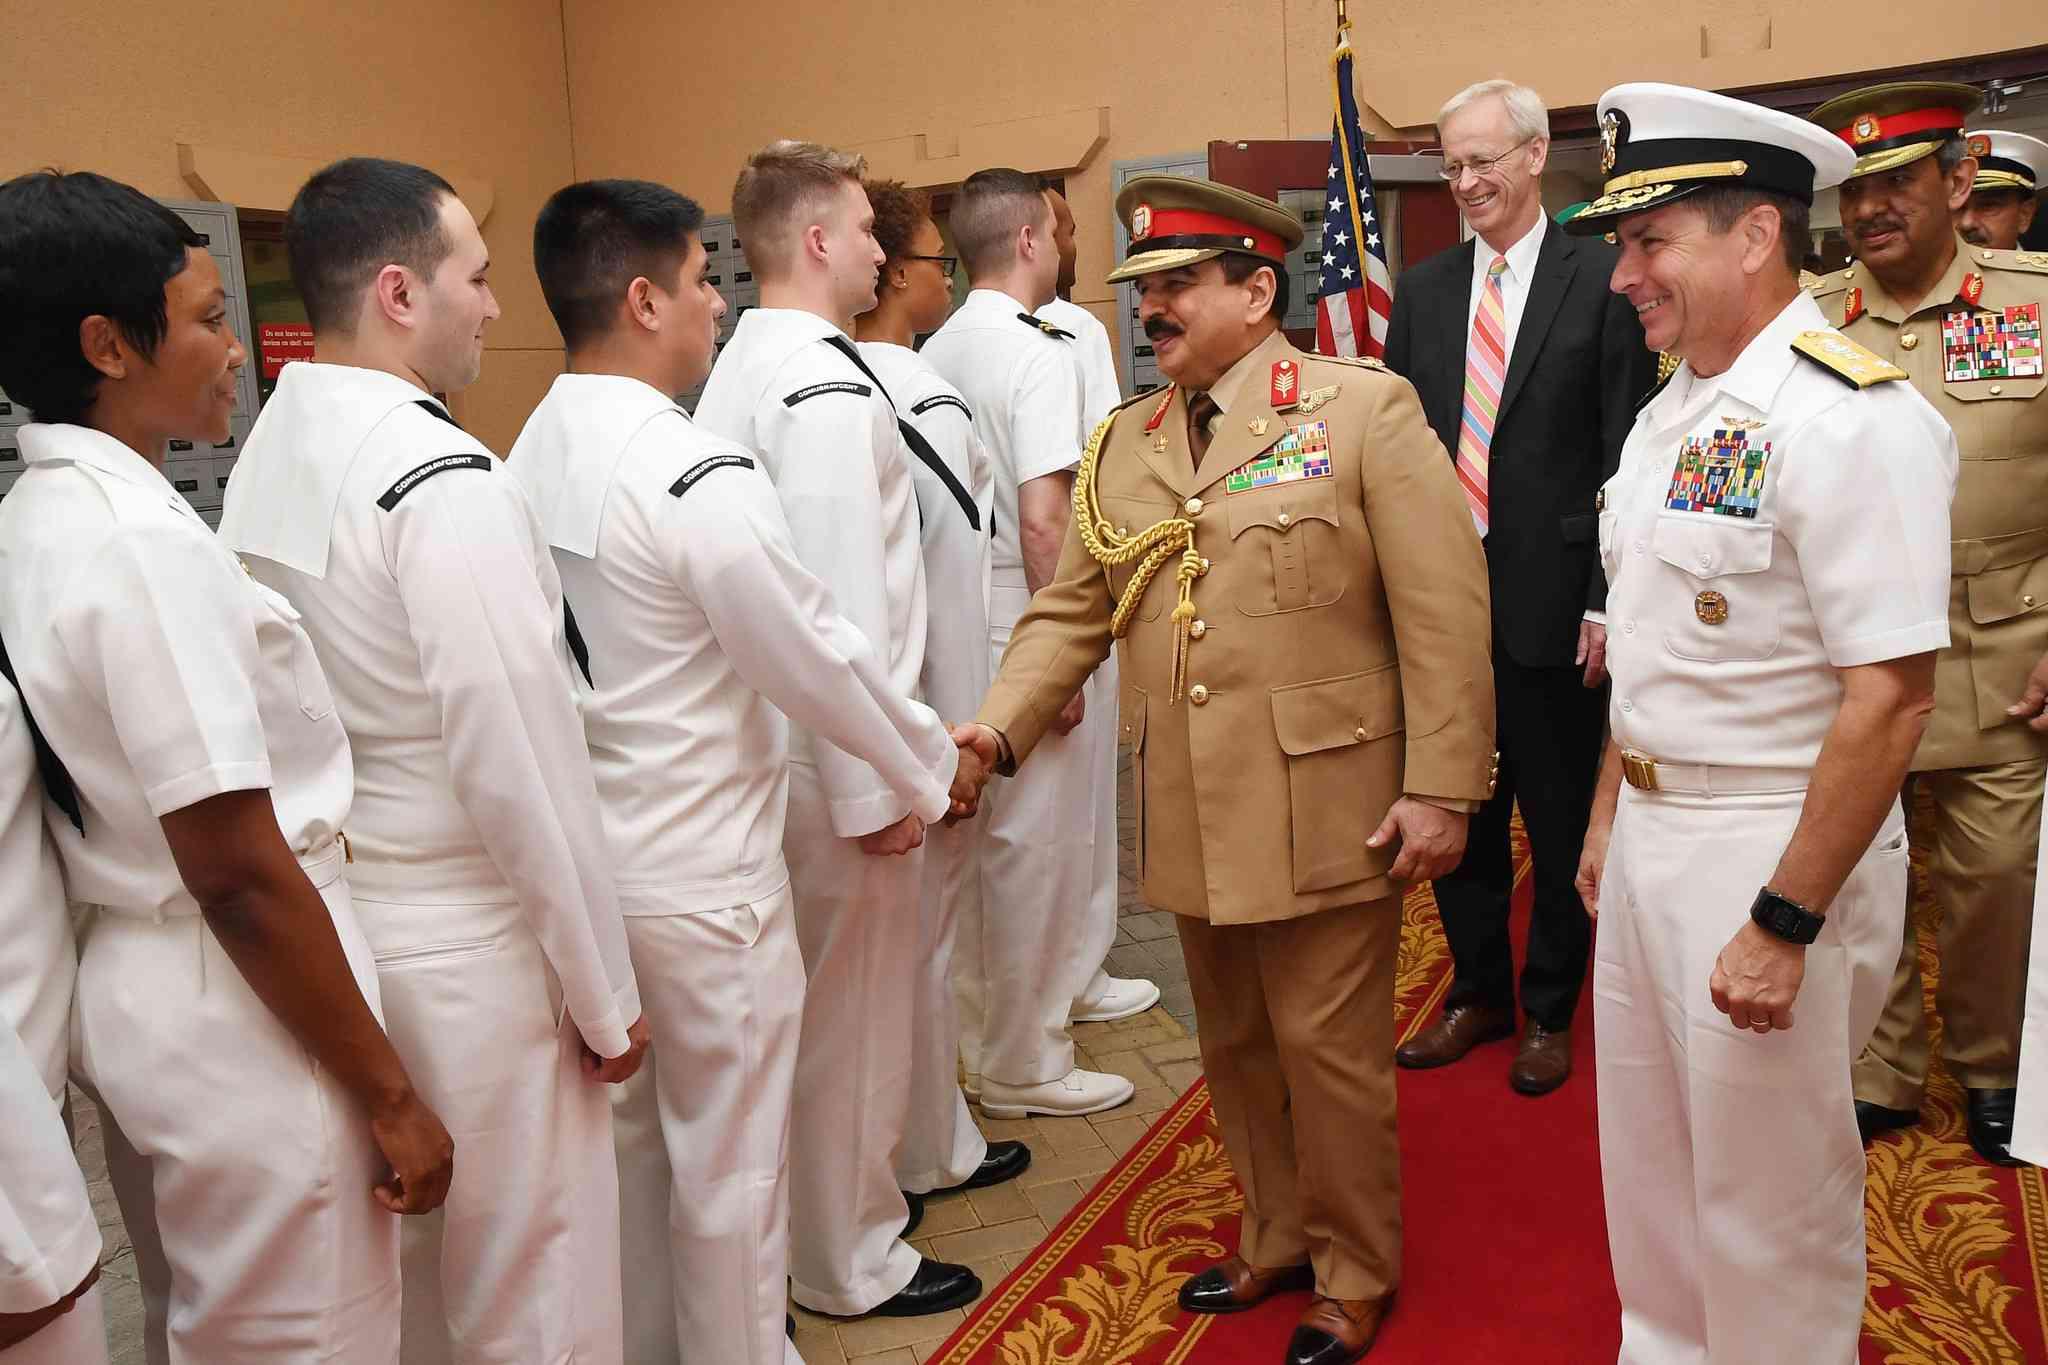 Hamad bin Isa Al Khalifa, the King of the Kingdom of Bahrain, shaking hands with Sailors.